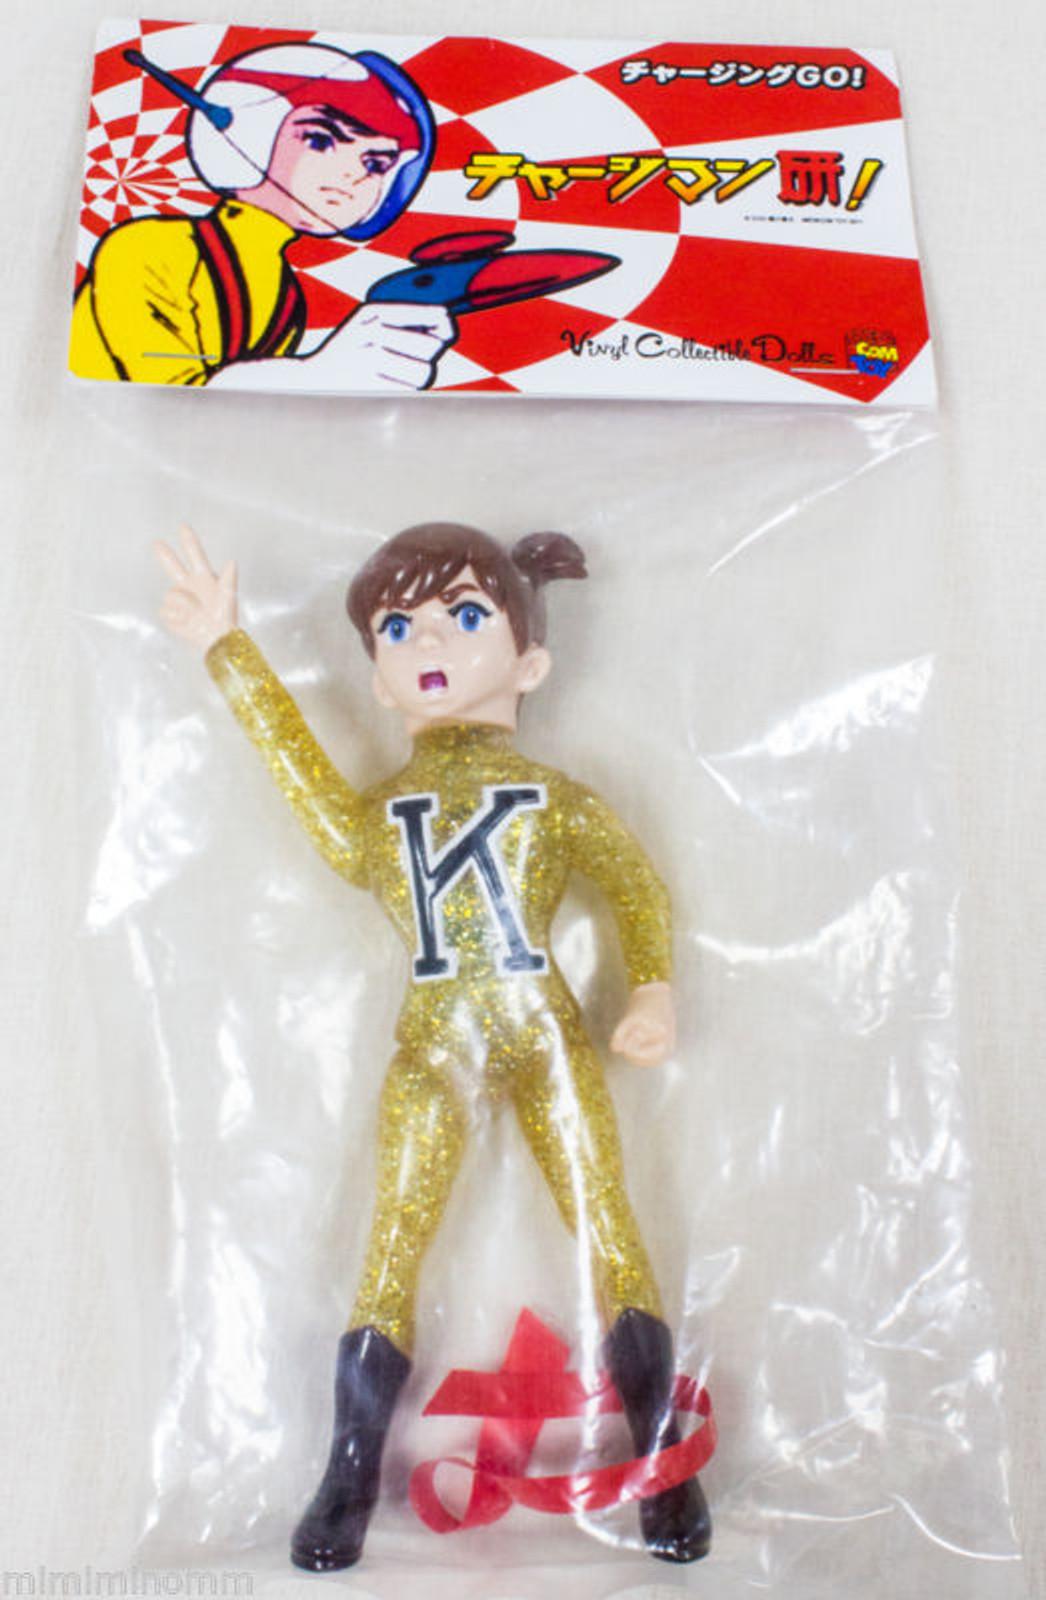 Charge Man Ken 300 Limited Figure Sparkle Medicom Toy VCD JAPAN ANIME MANGA